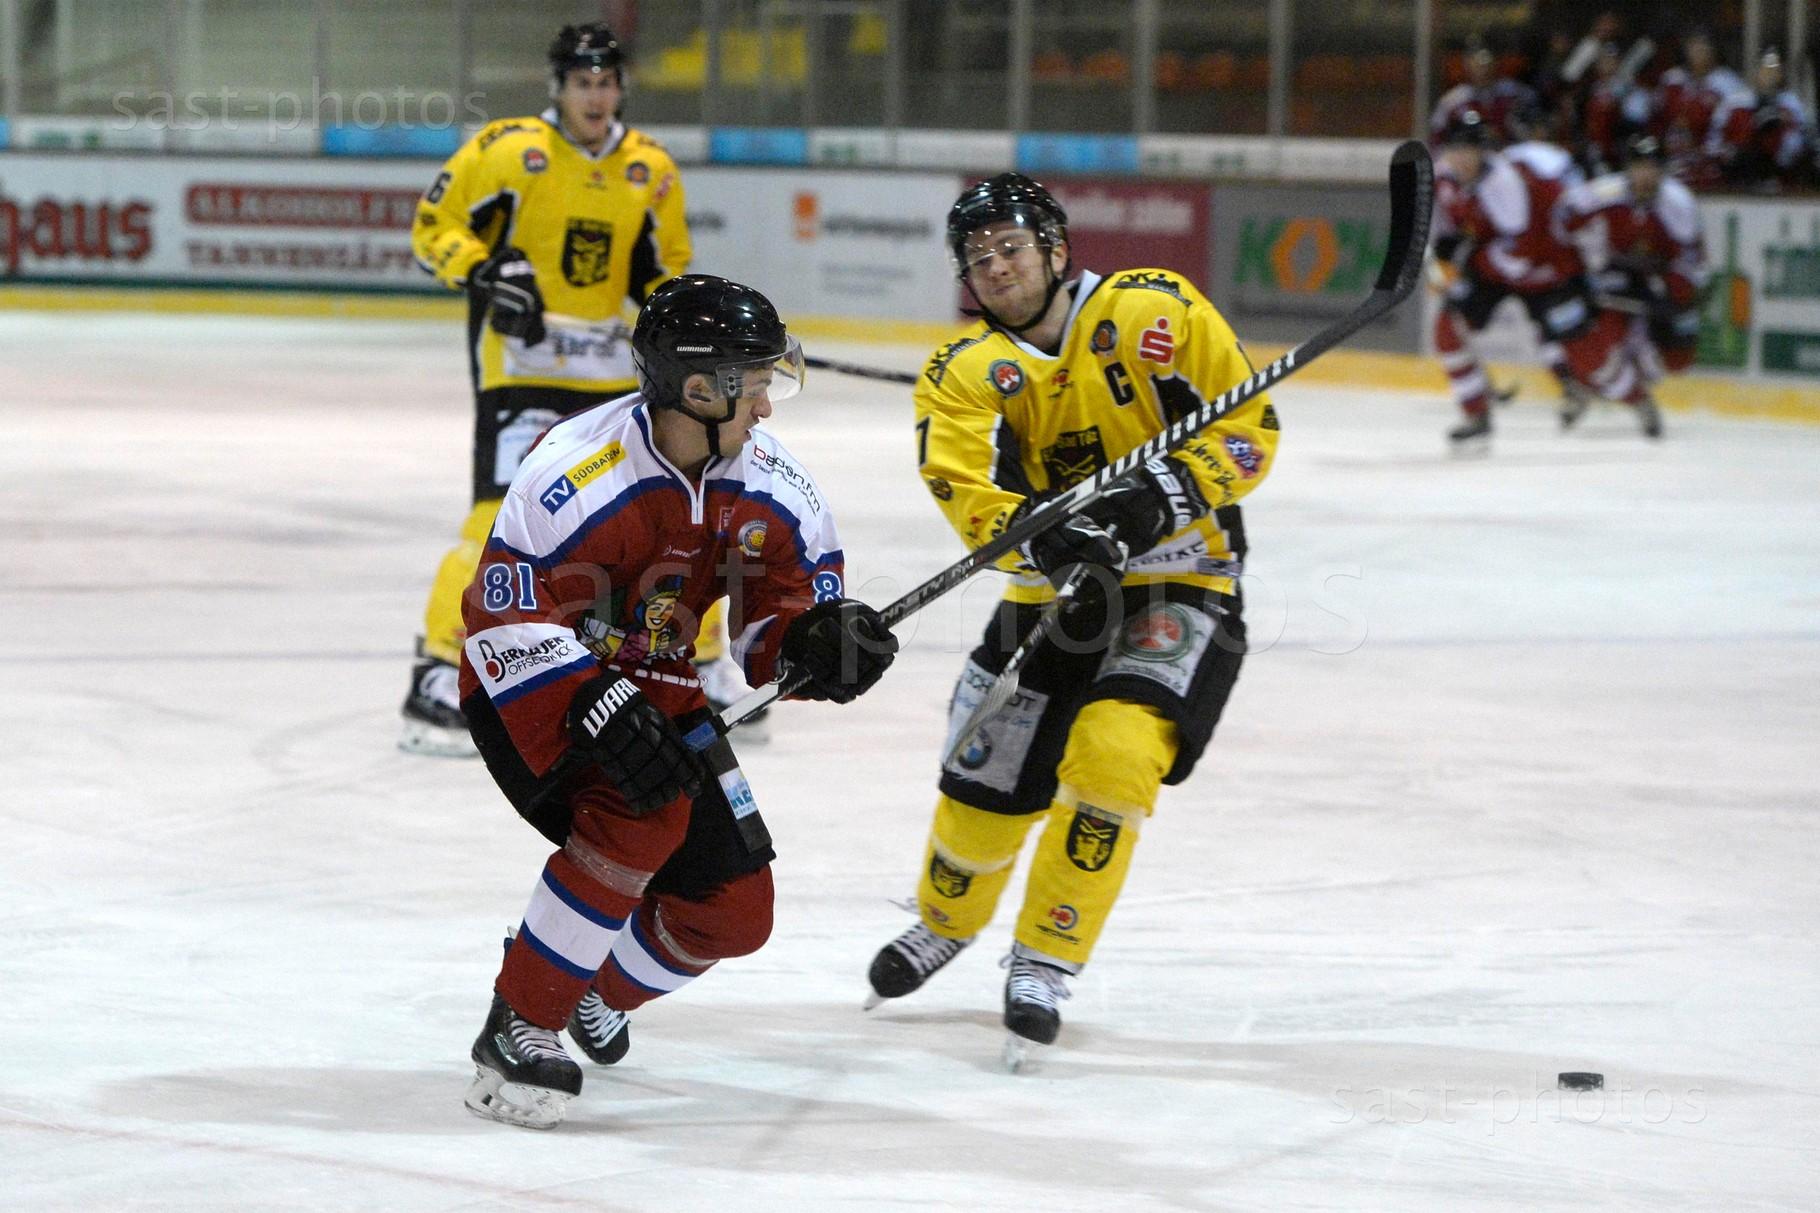 Chris Billich (L. Freiburg) gegen Christian Kolacny (Bad Toelz)